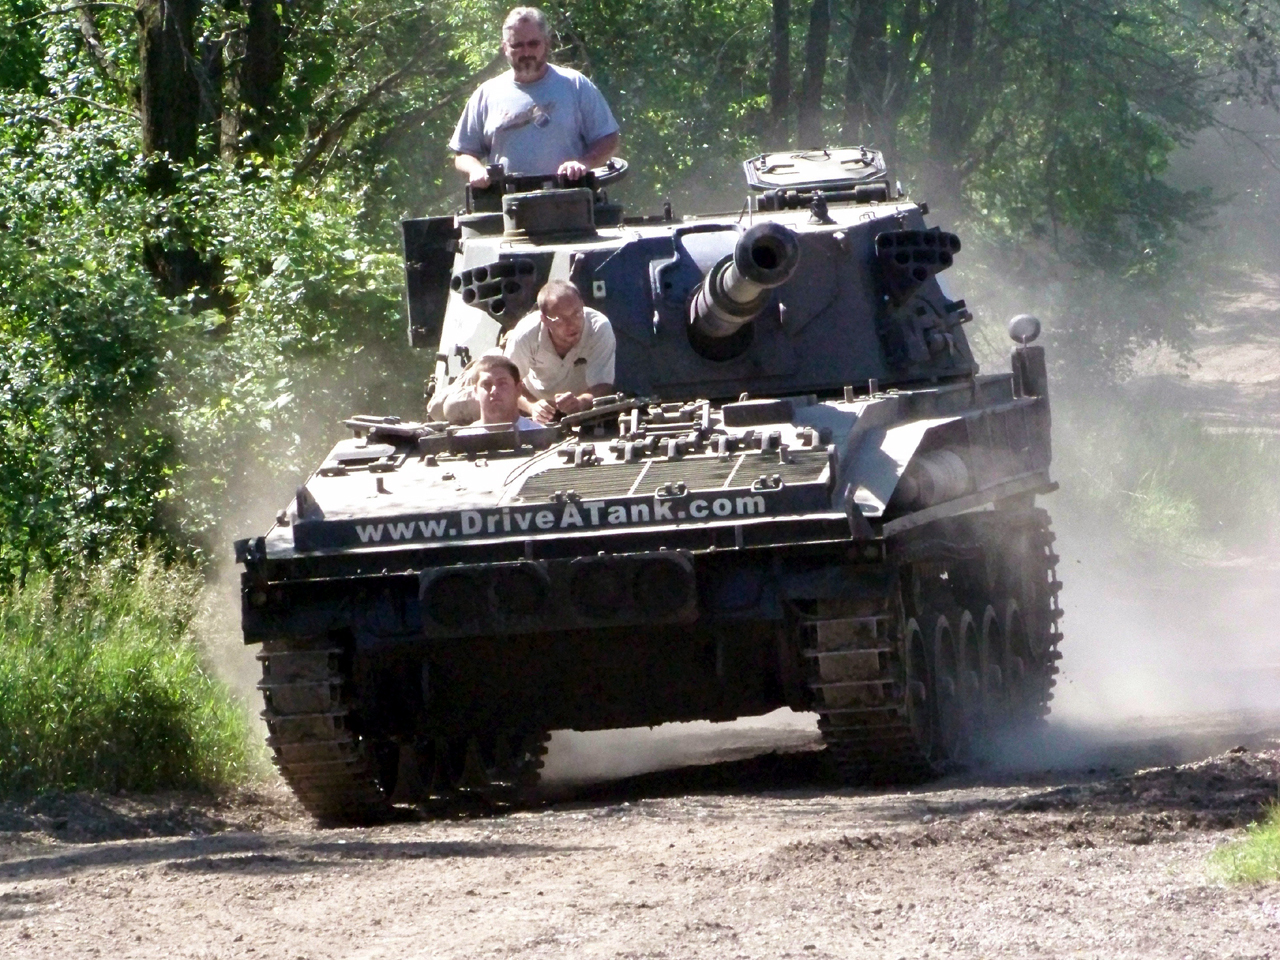 tank drive surplus military vehicles behind armored wheel puts minn quarry customers